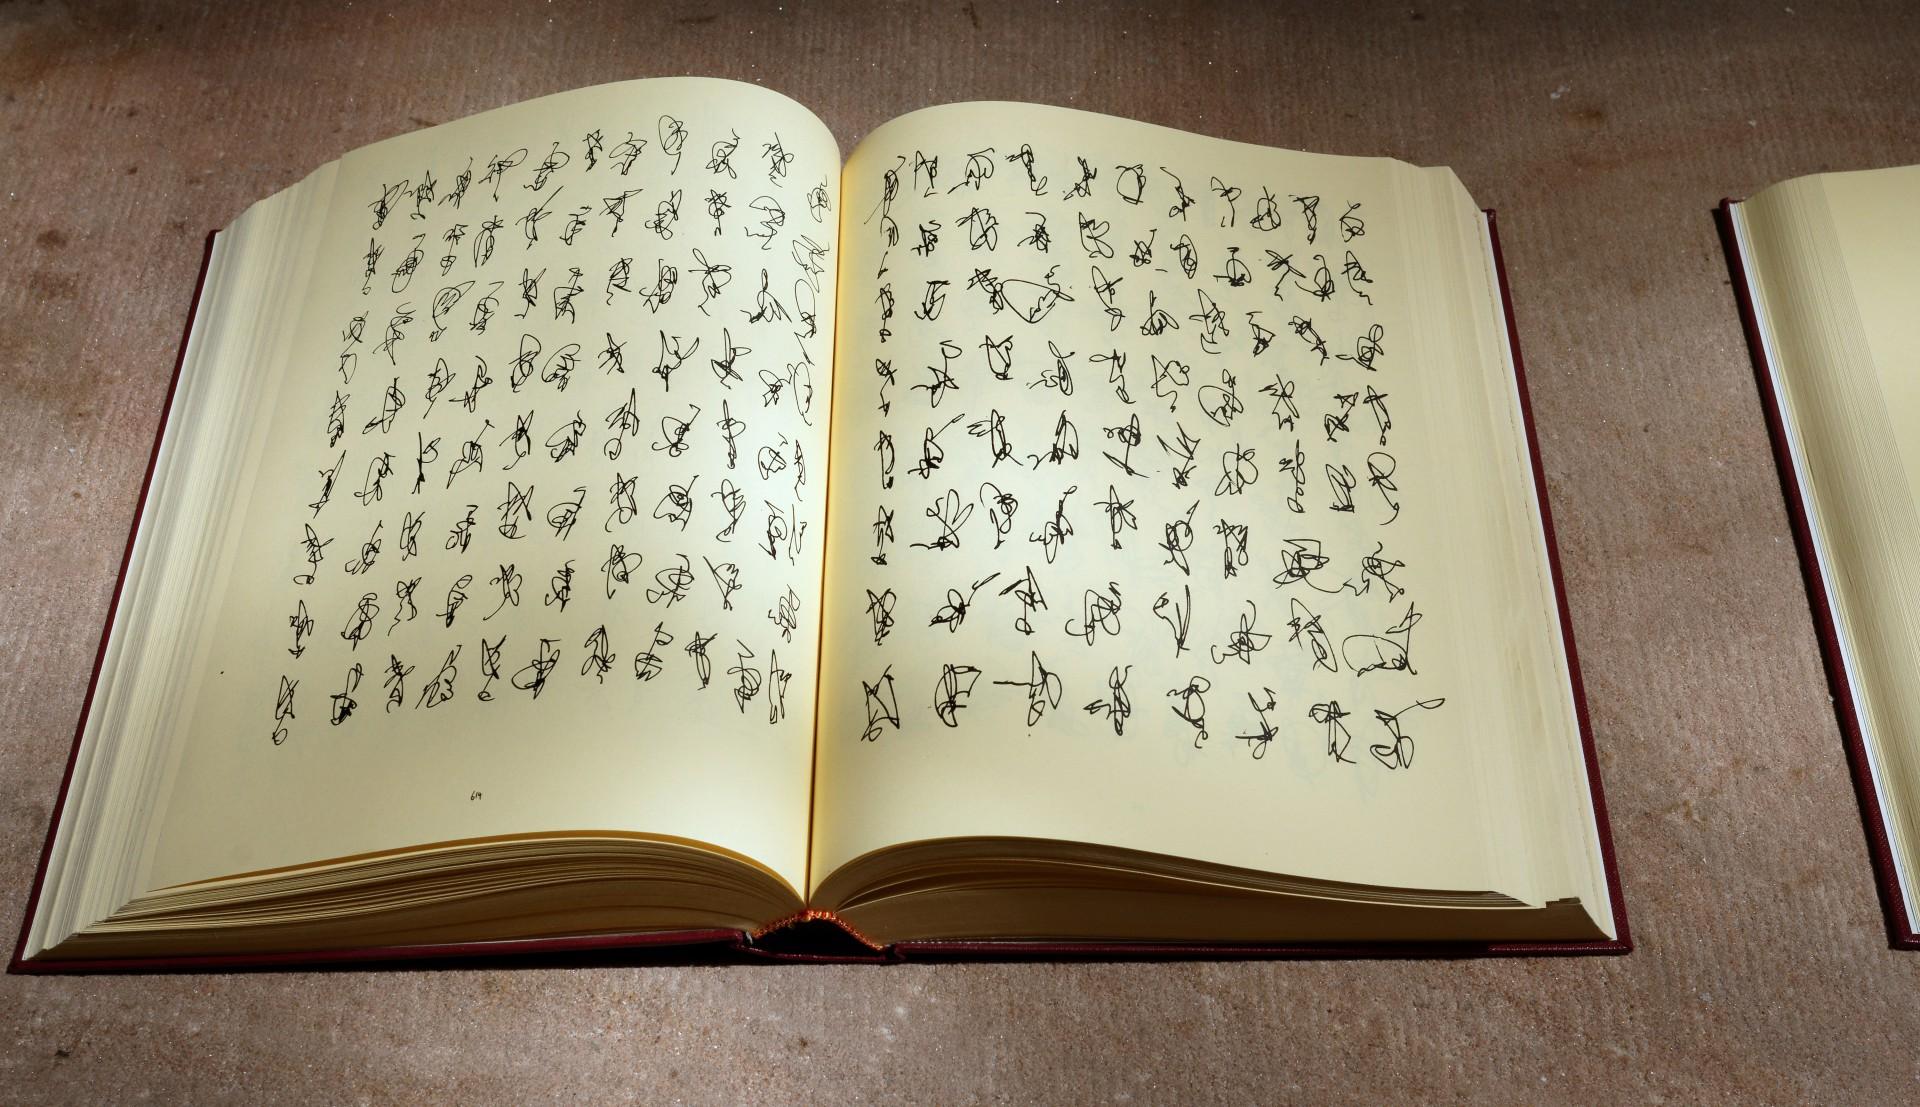 Tagebuch, 1990, Band 2, Seite 616, 617, 21 x 29,7 cm